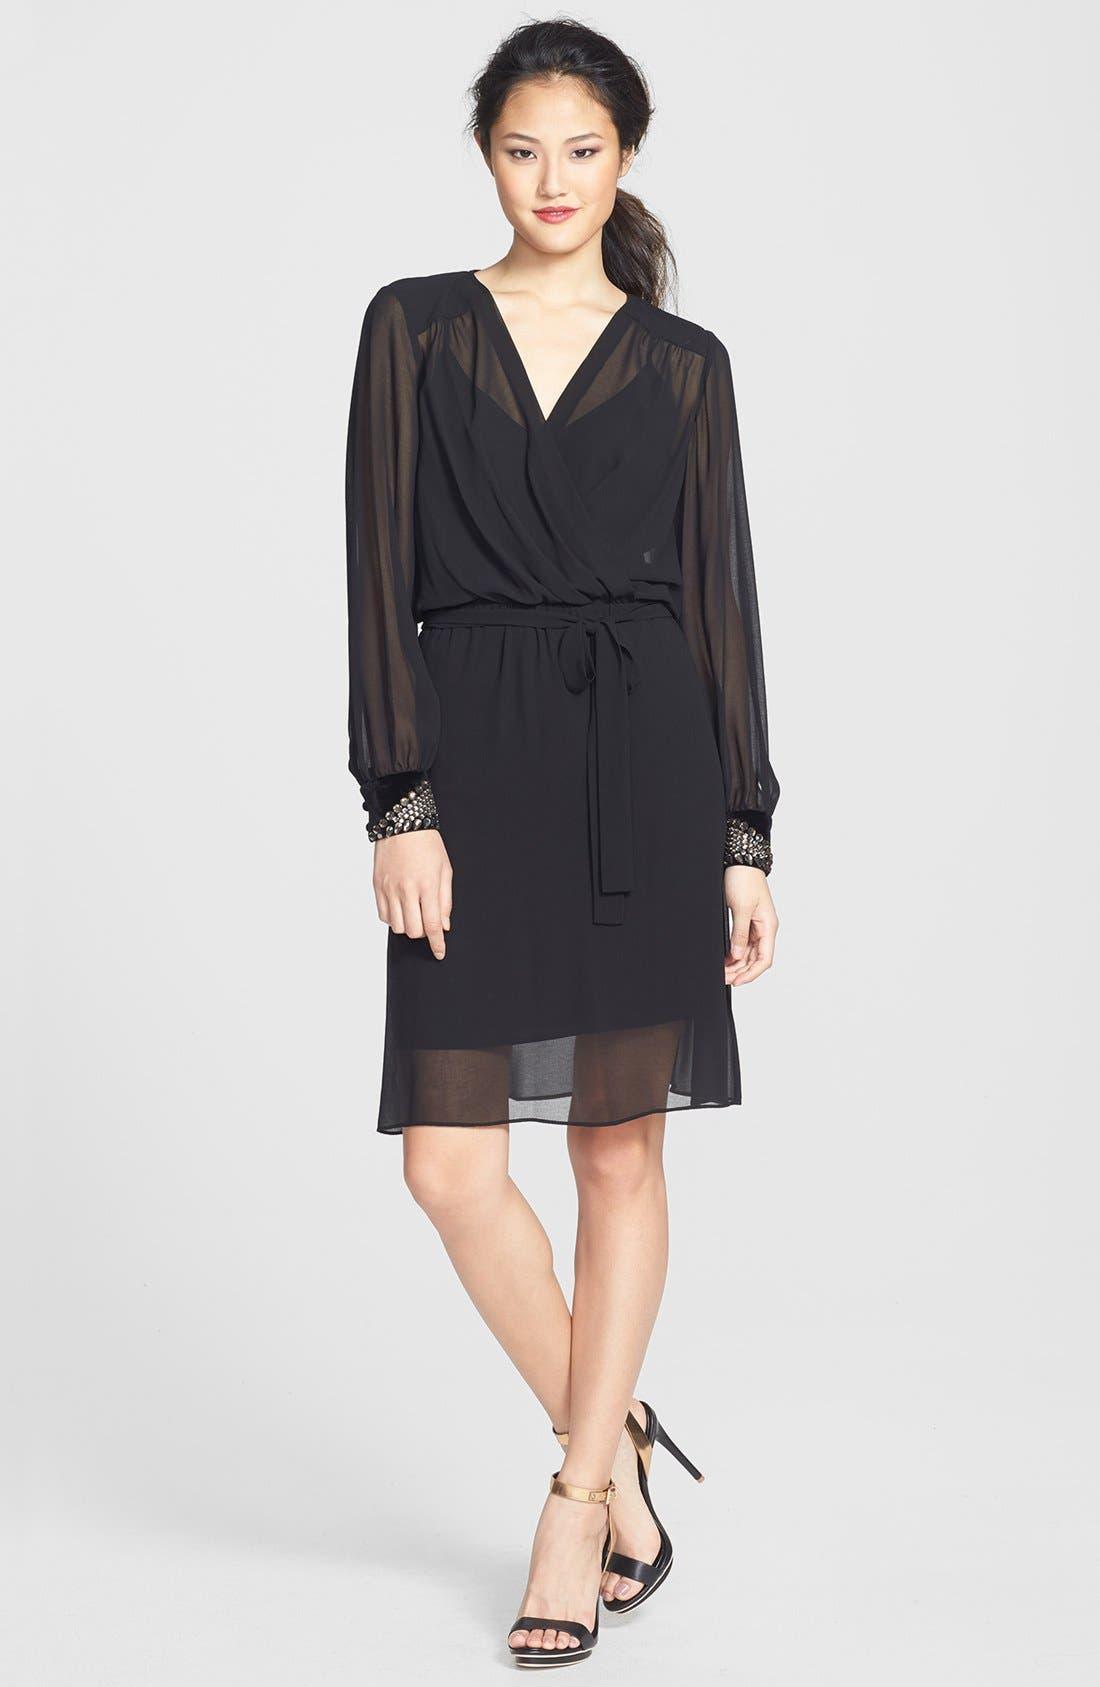 Alternate Image 1 Selected - Donna Morgan Embellished Cuffs Faux Wrap Chiffon Dress